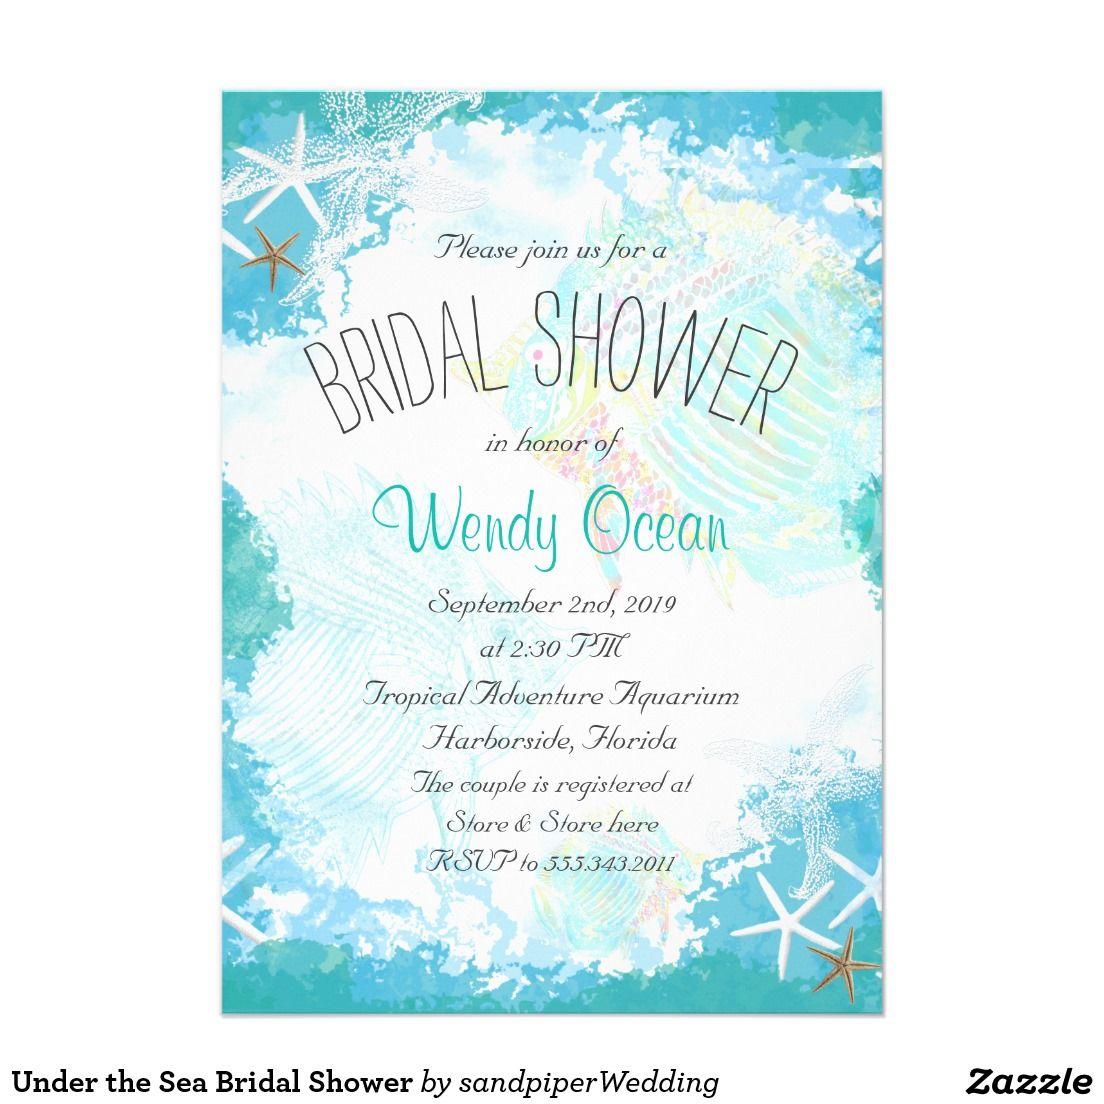 Under the sea bridal shower wedding bridal shower invitations under the sea bridal shower filmwisefo Images